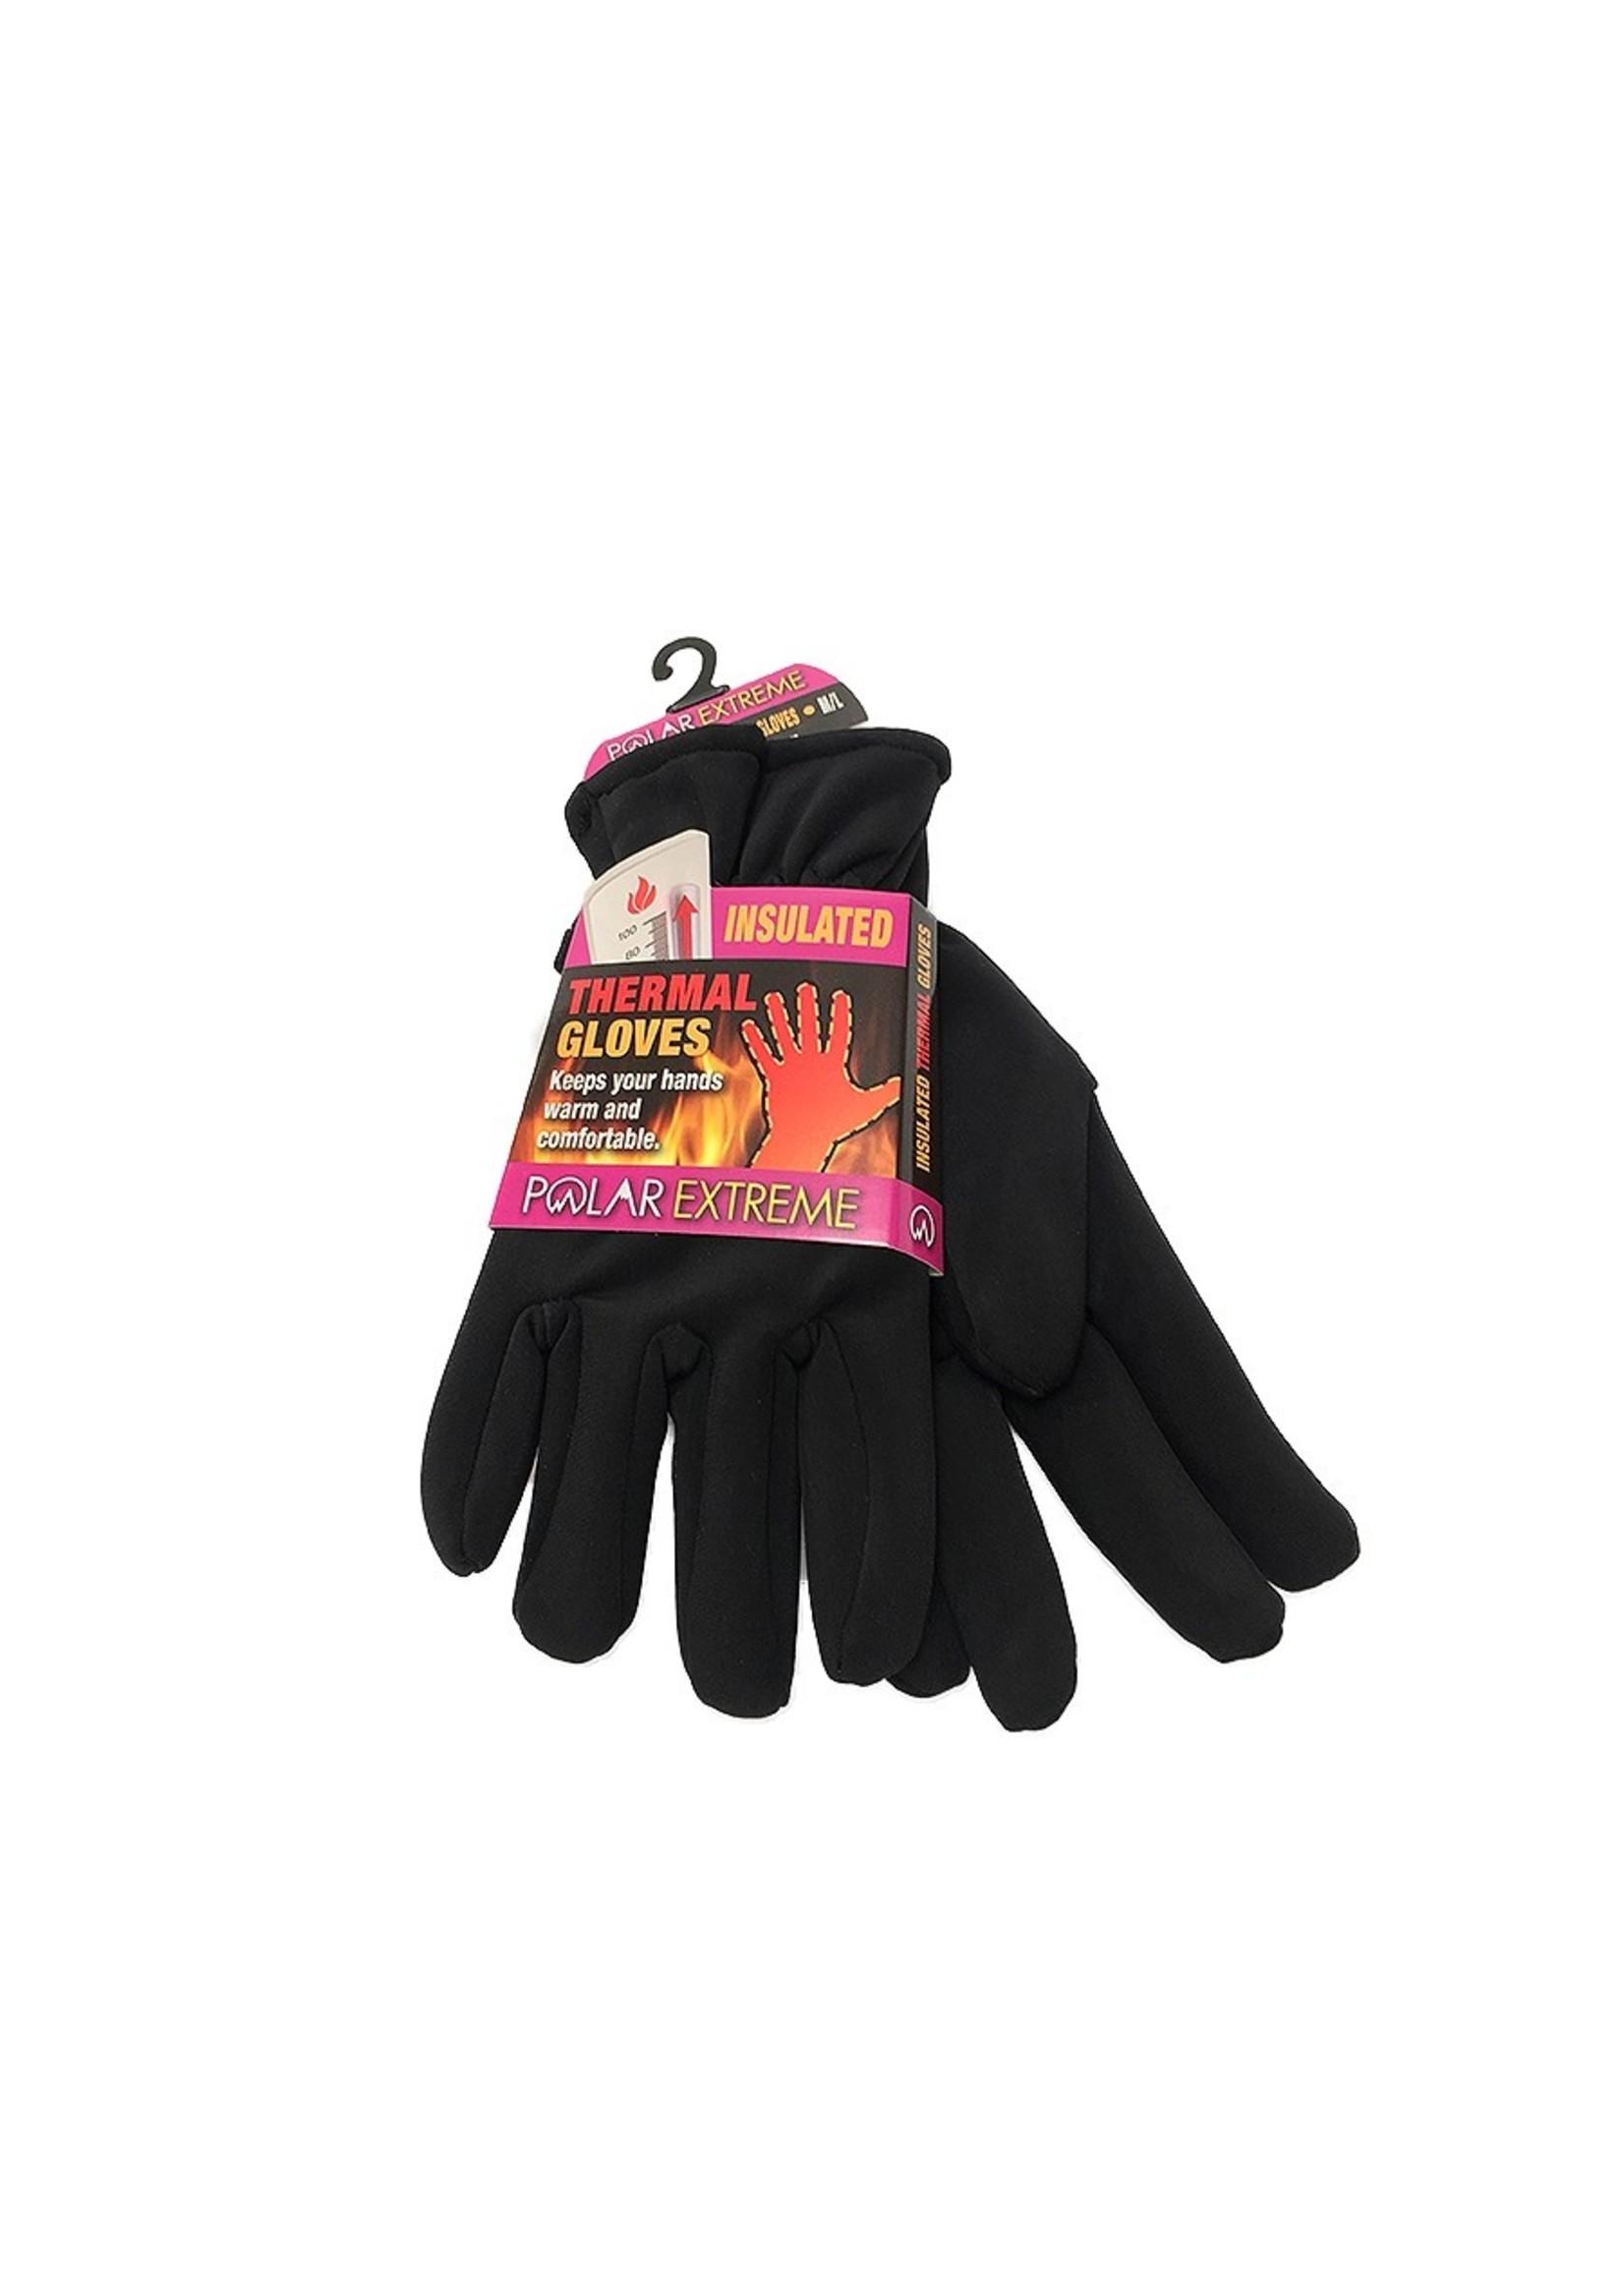 Polar Extreme Polar Extreme Heat Stretch Lined Gloves